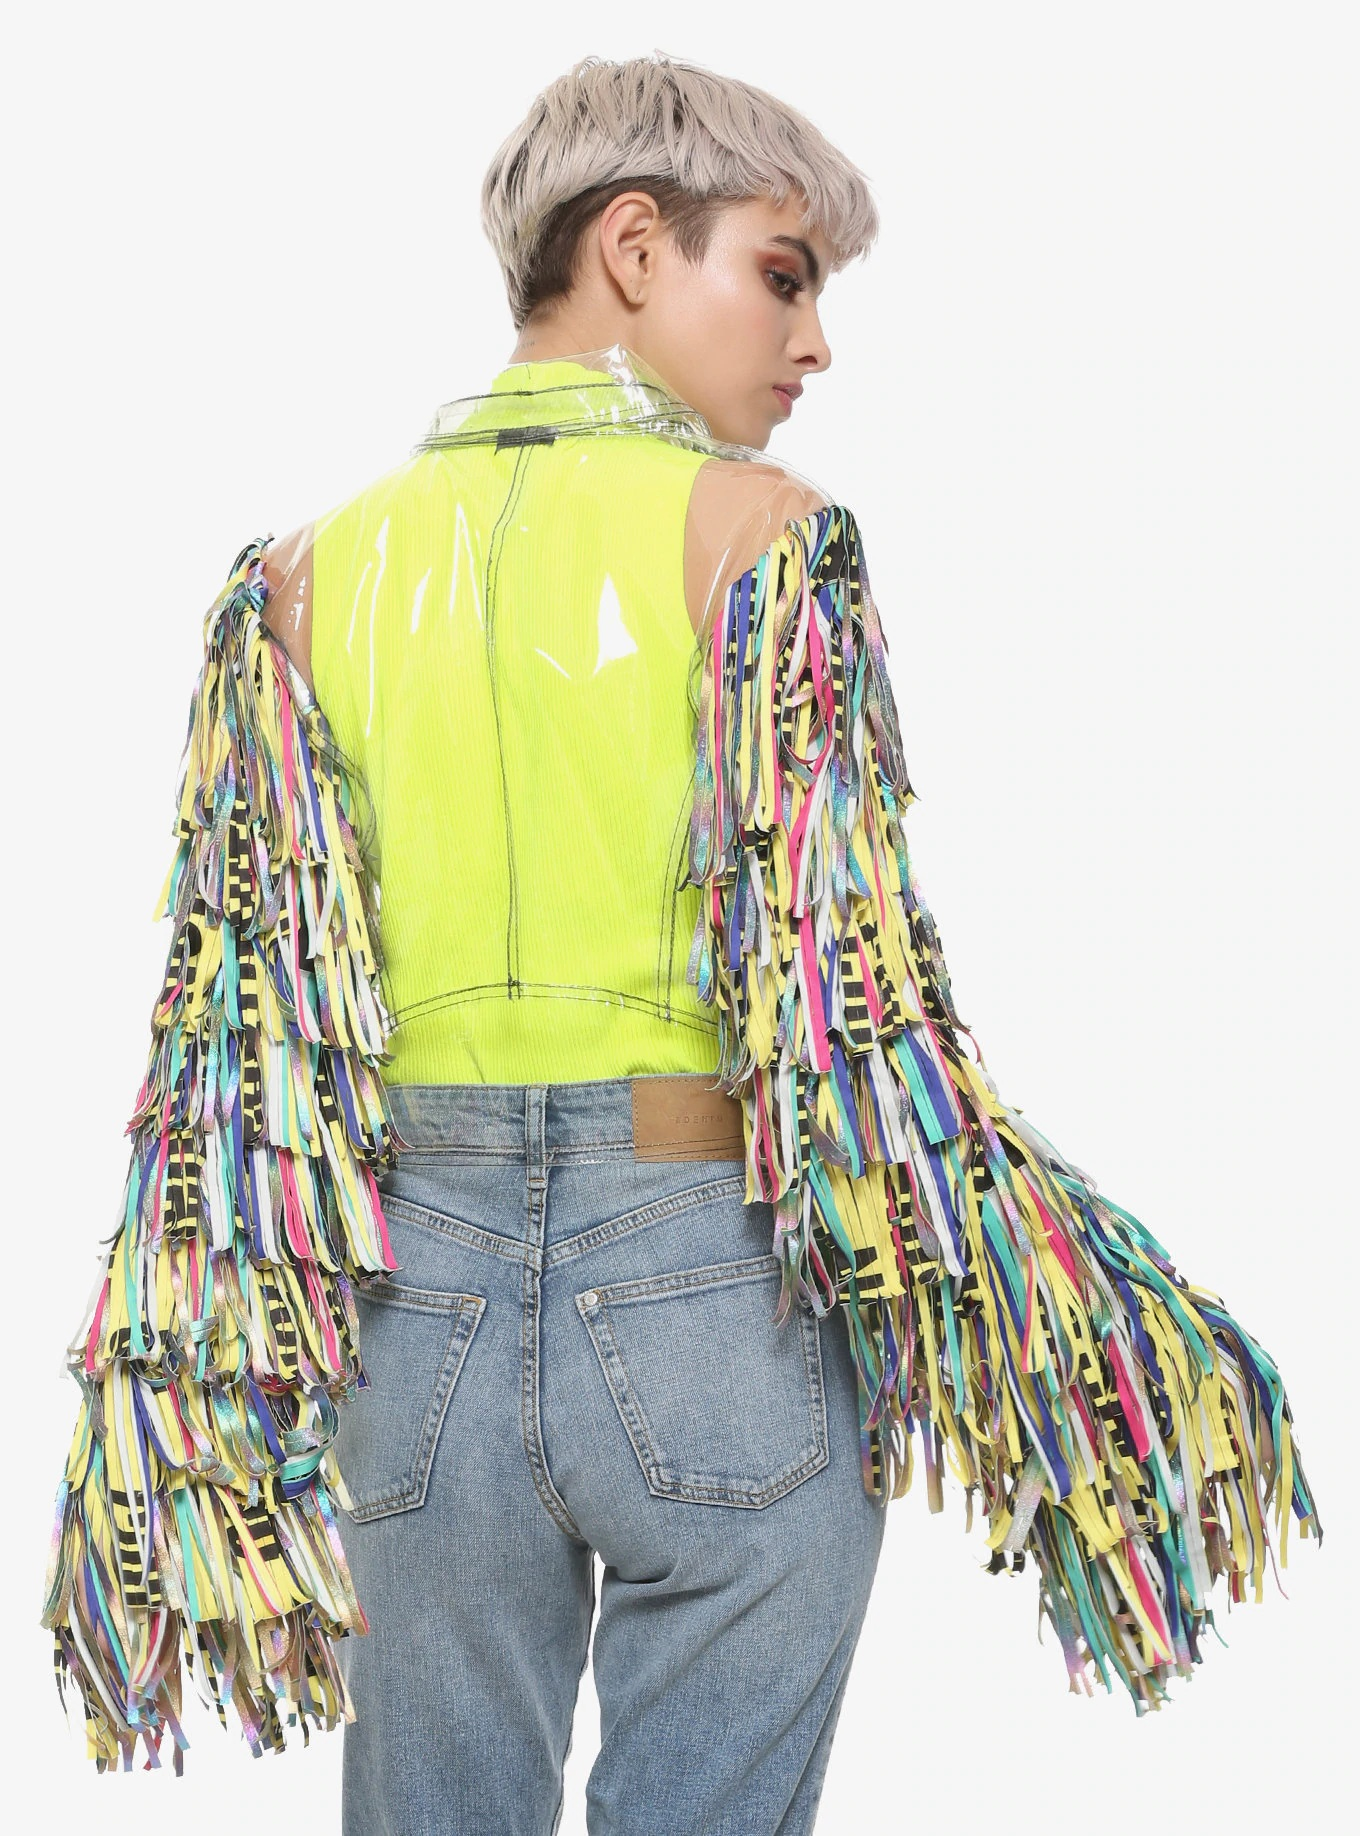 Harley Quinn Dc Comics Birds Of Prey Tape Girls Jacket Rockstar Jacket